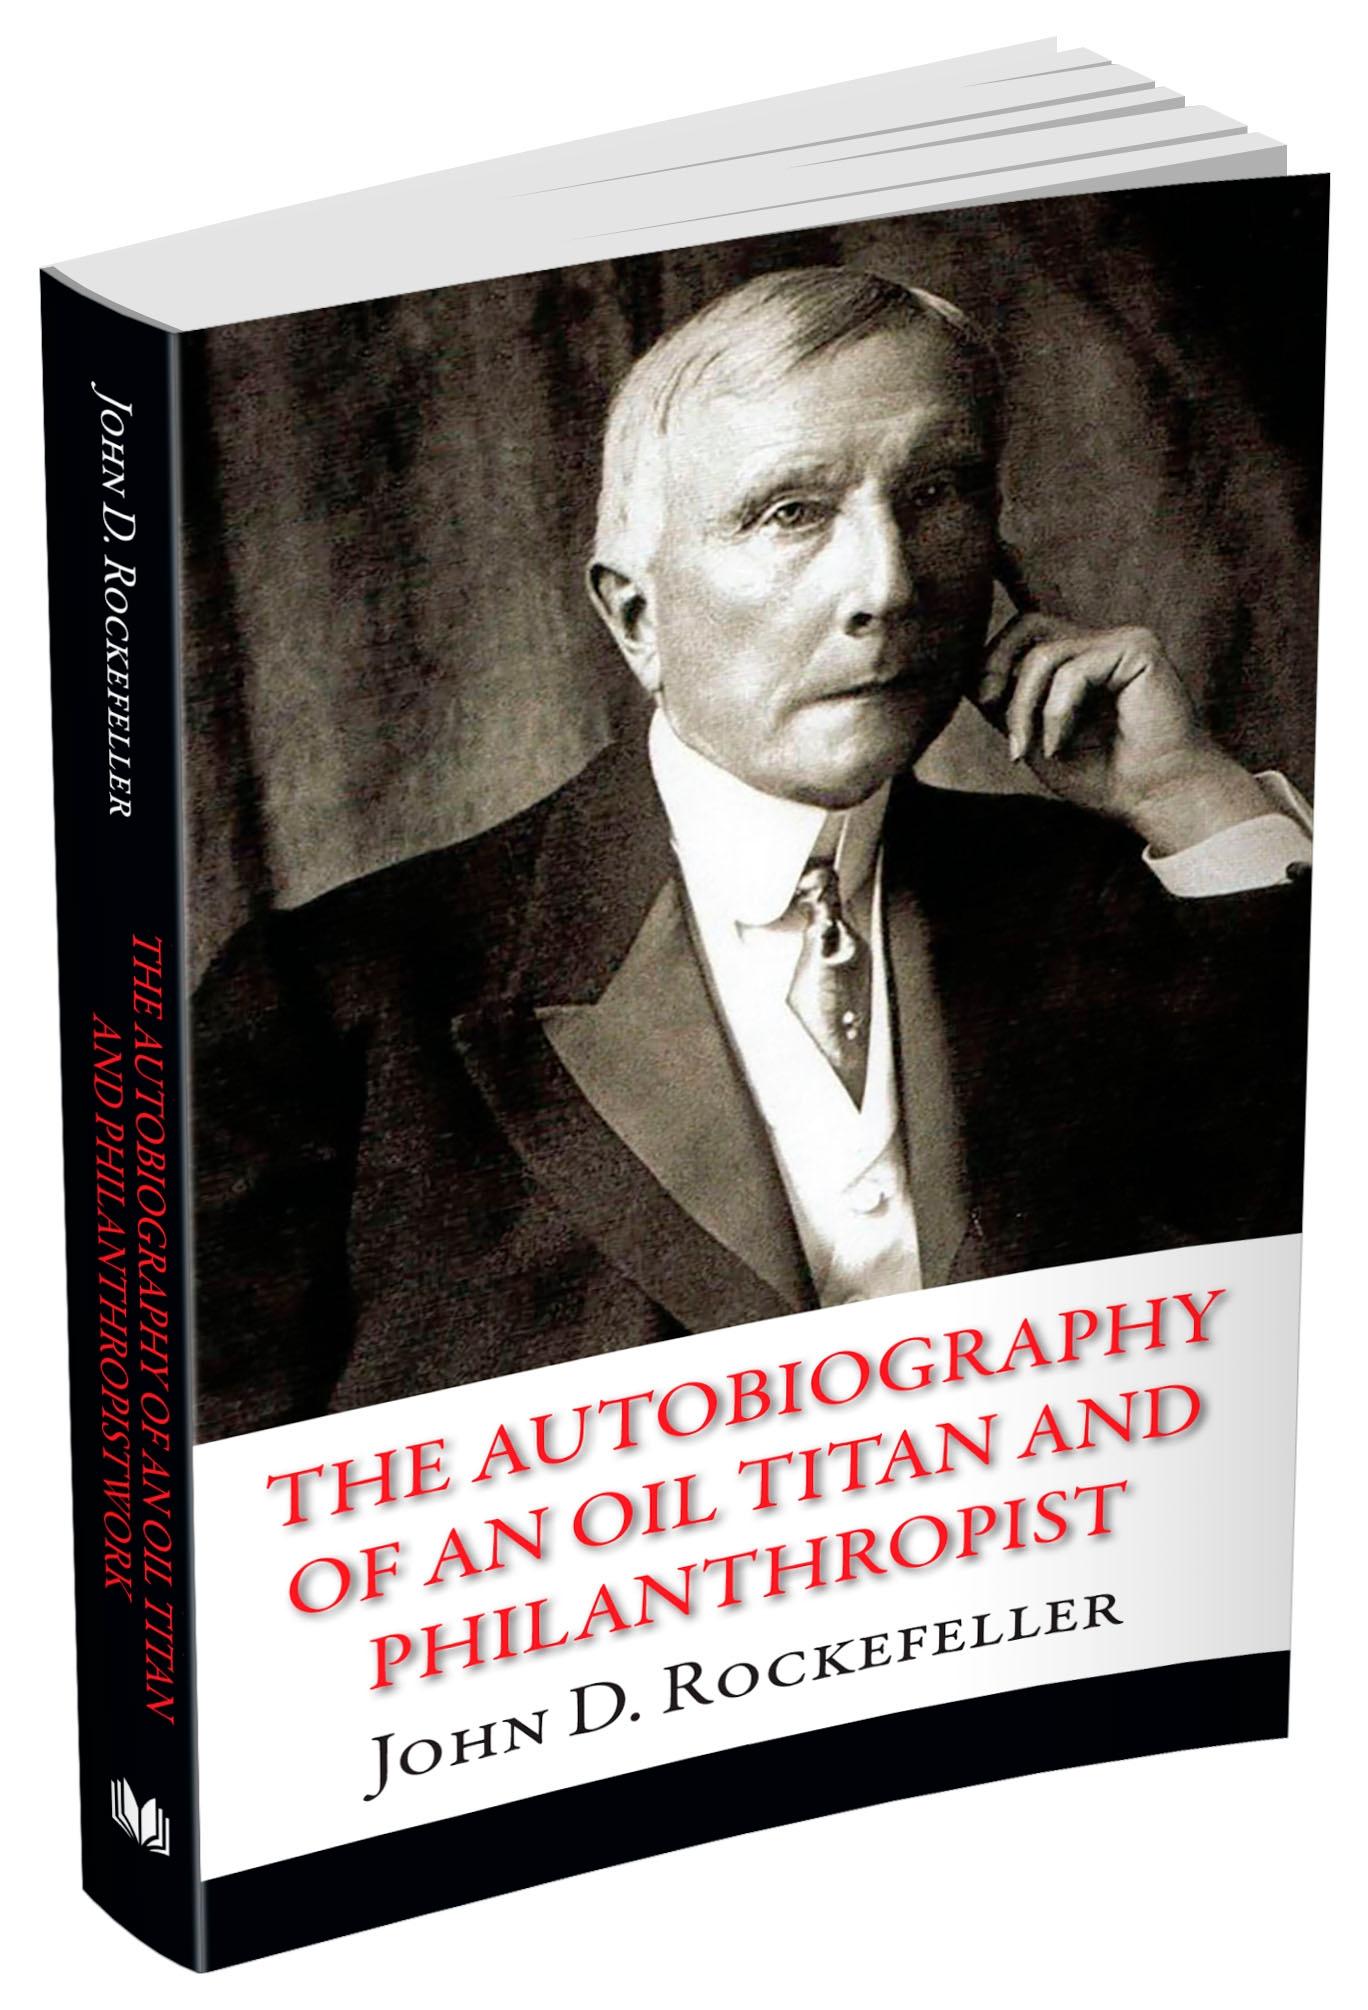 The Autobiography of an Oil Titan and Philanthropist John D. Rockefeller